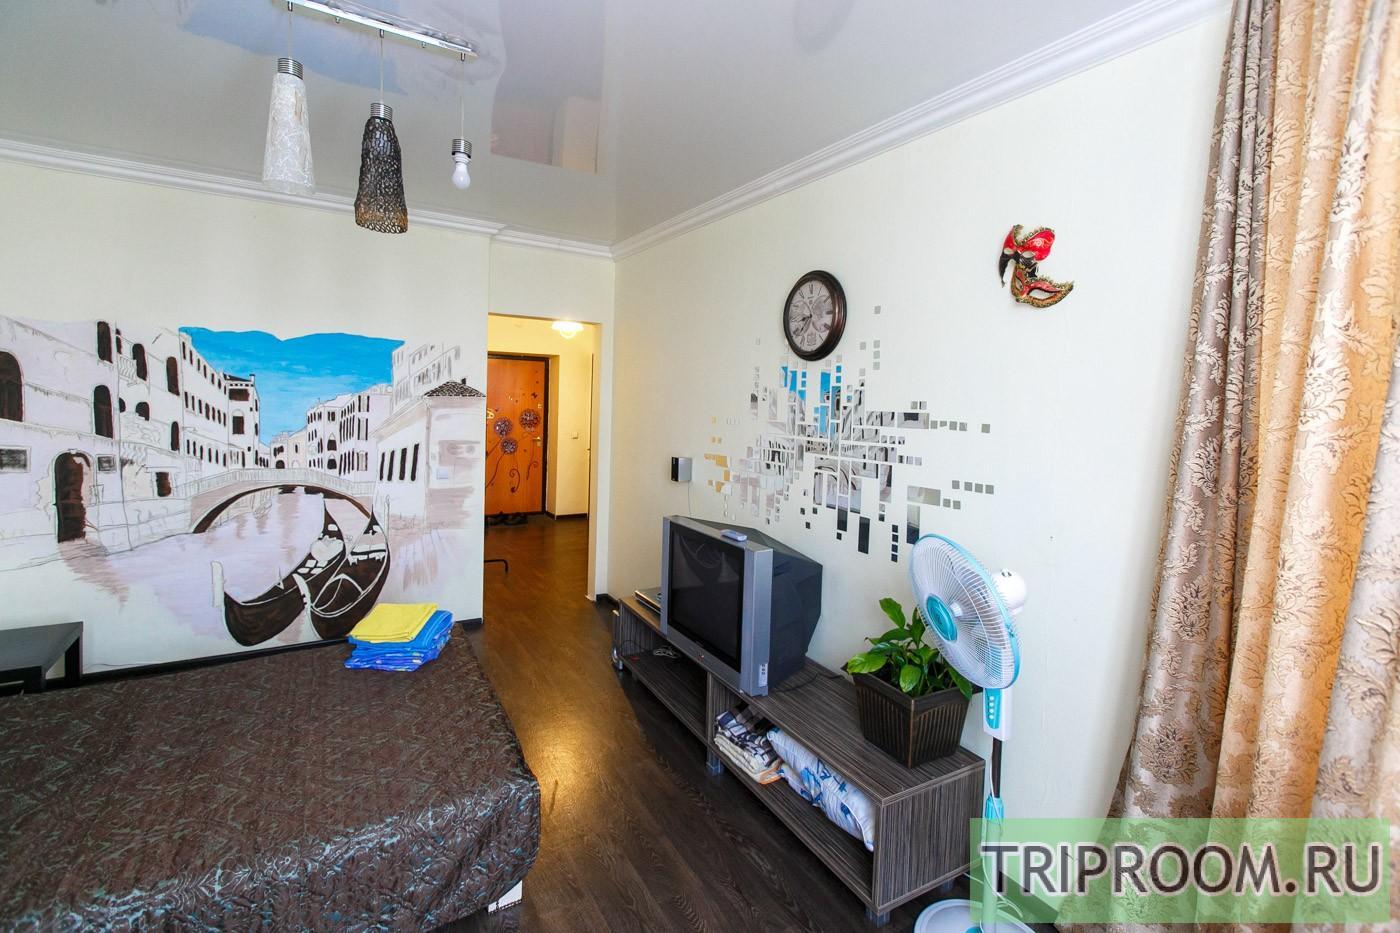 1-комнатная квартира посуточно (вариант № 28539), ул. П.И. Смородина, фото № 3